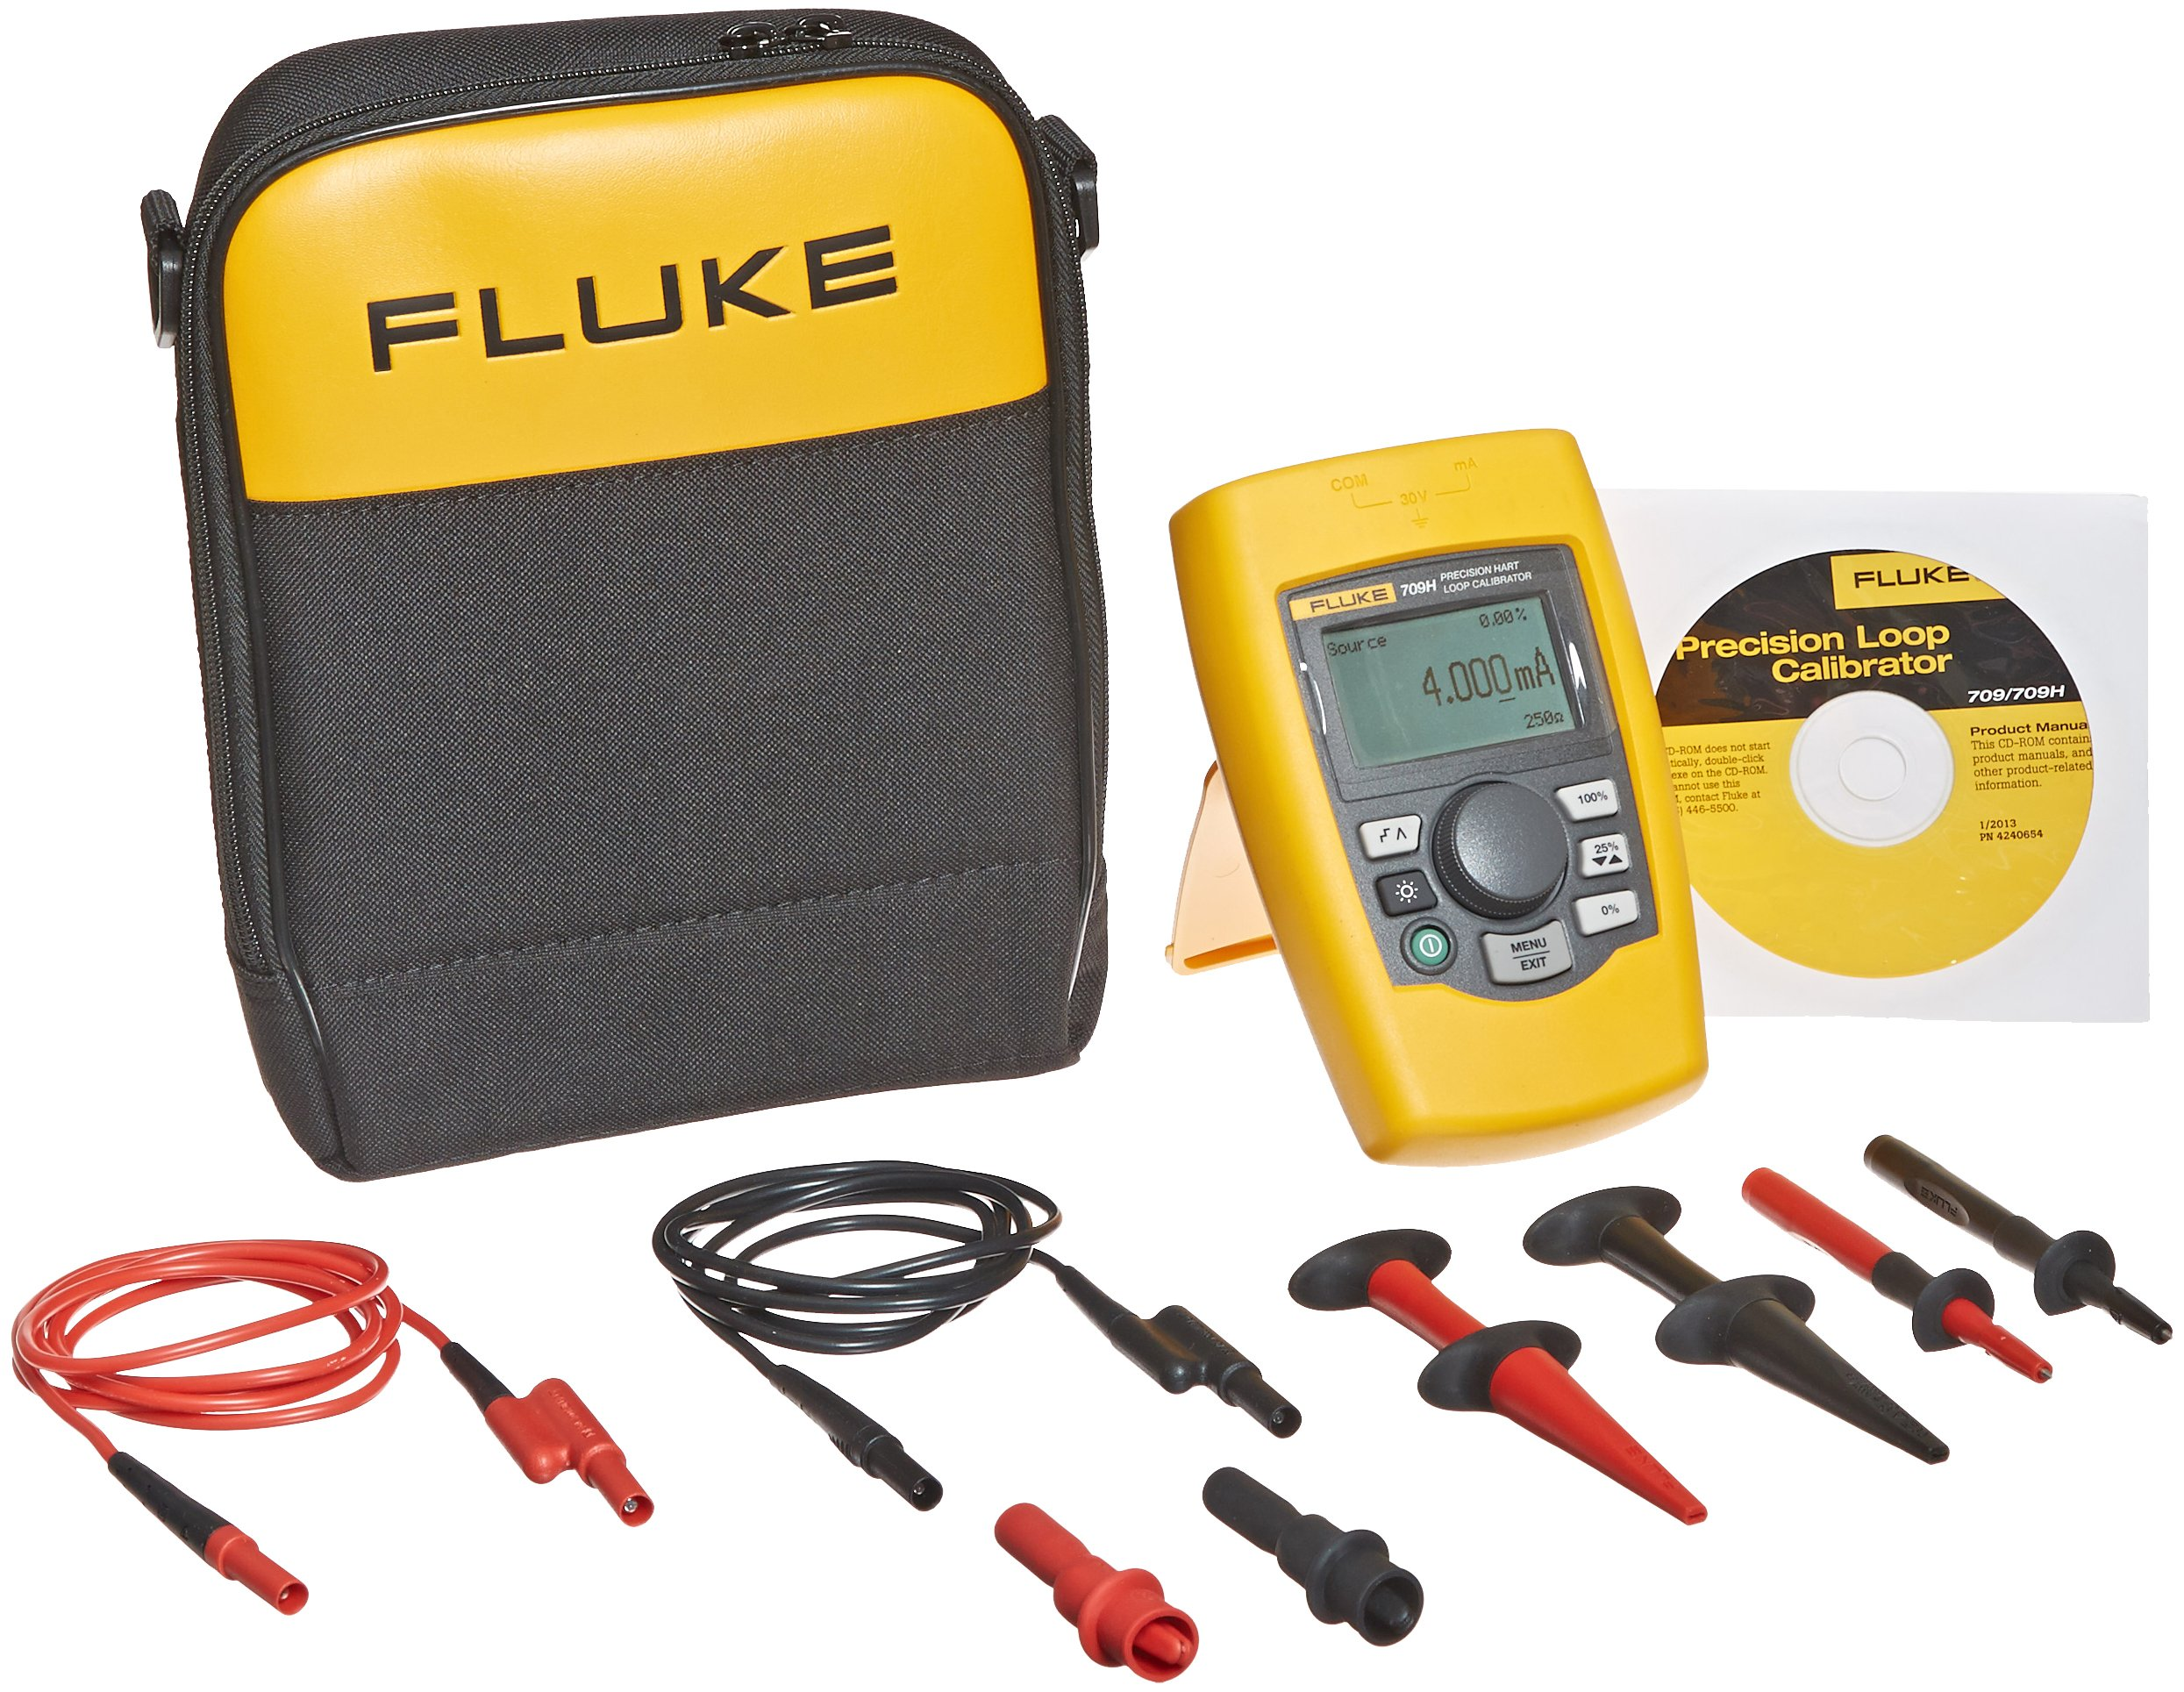 Fluke 709H Loop Calibrator with HART communication